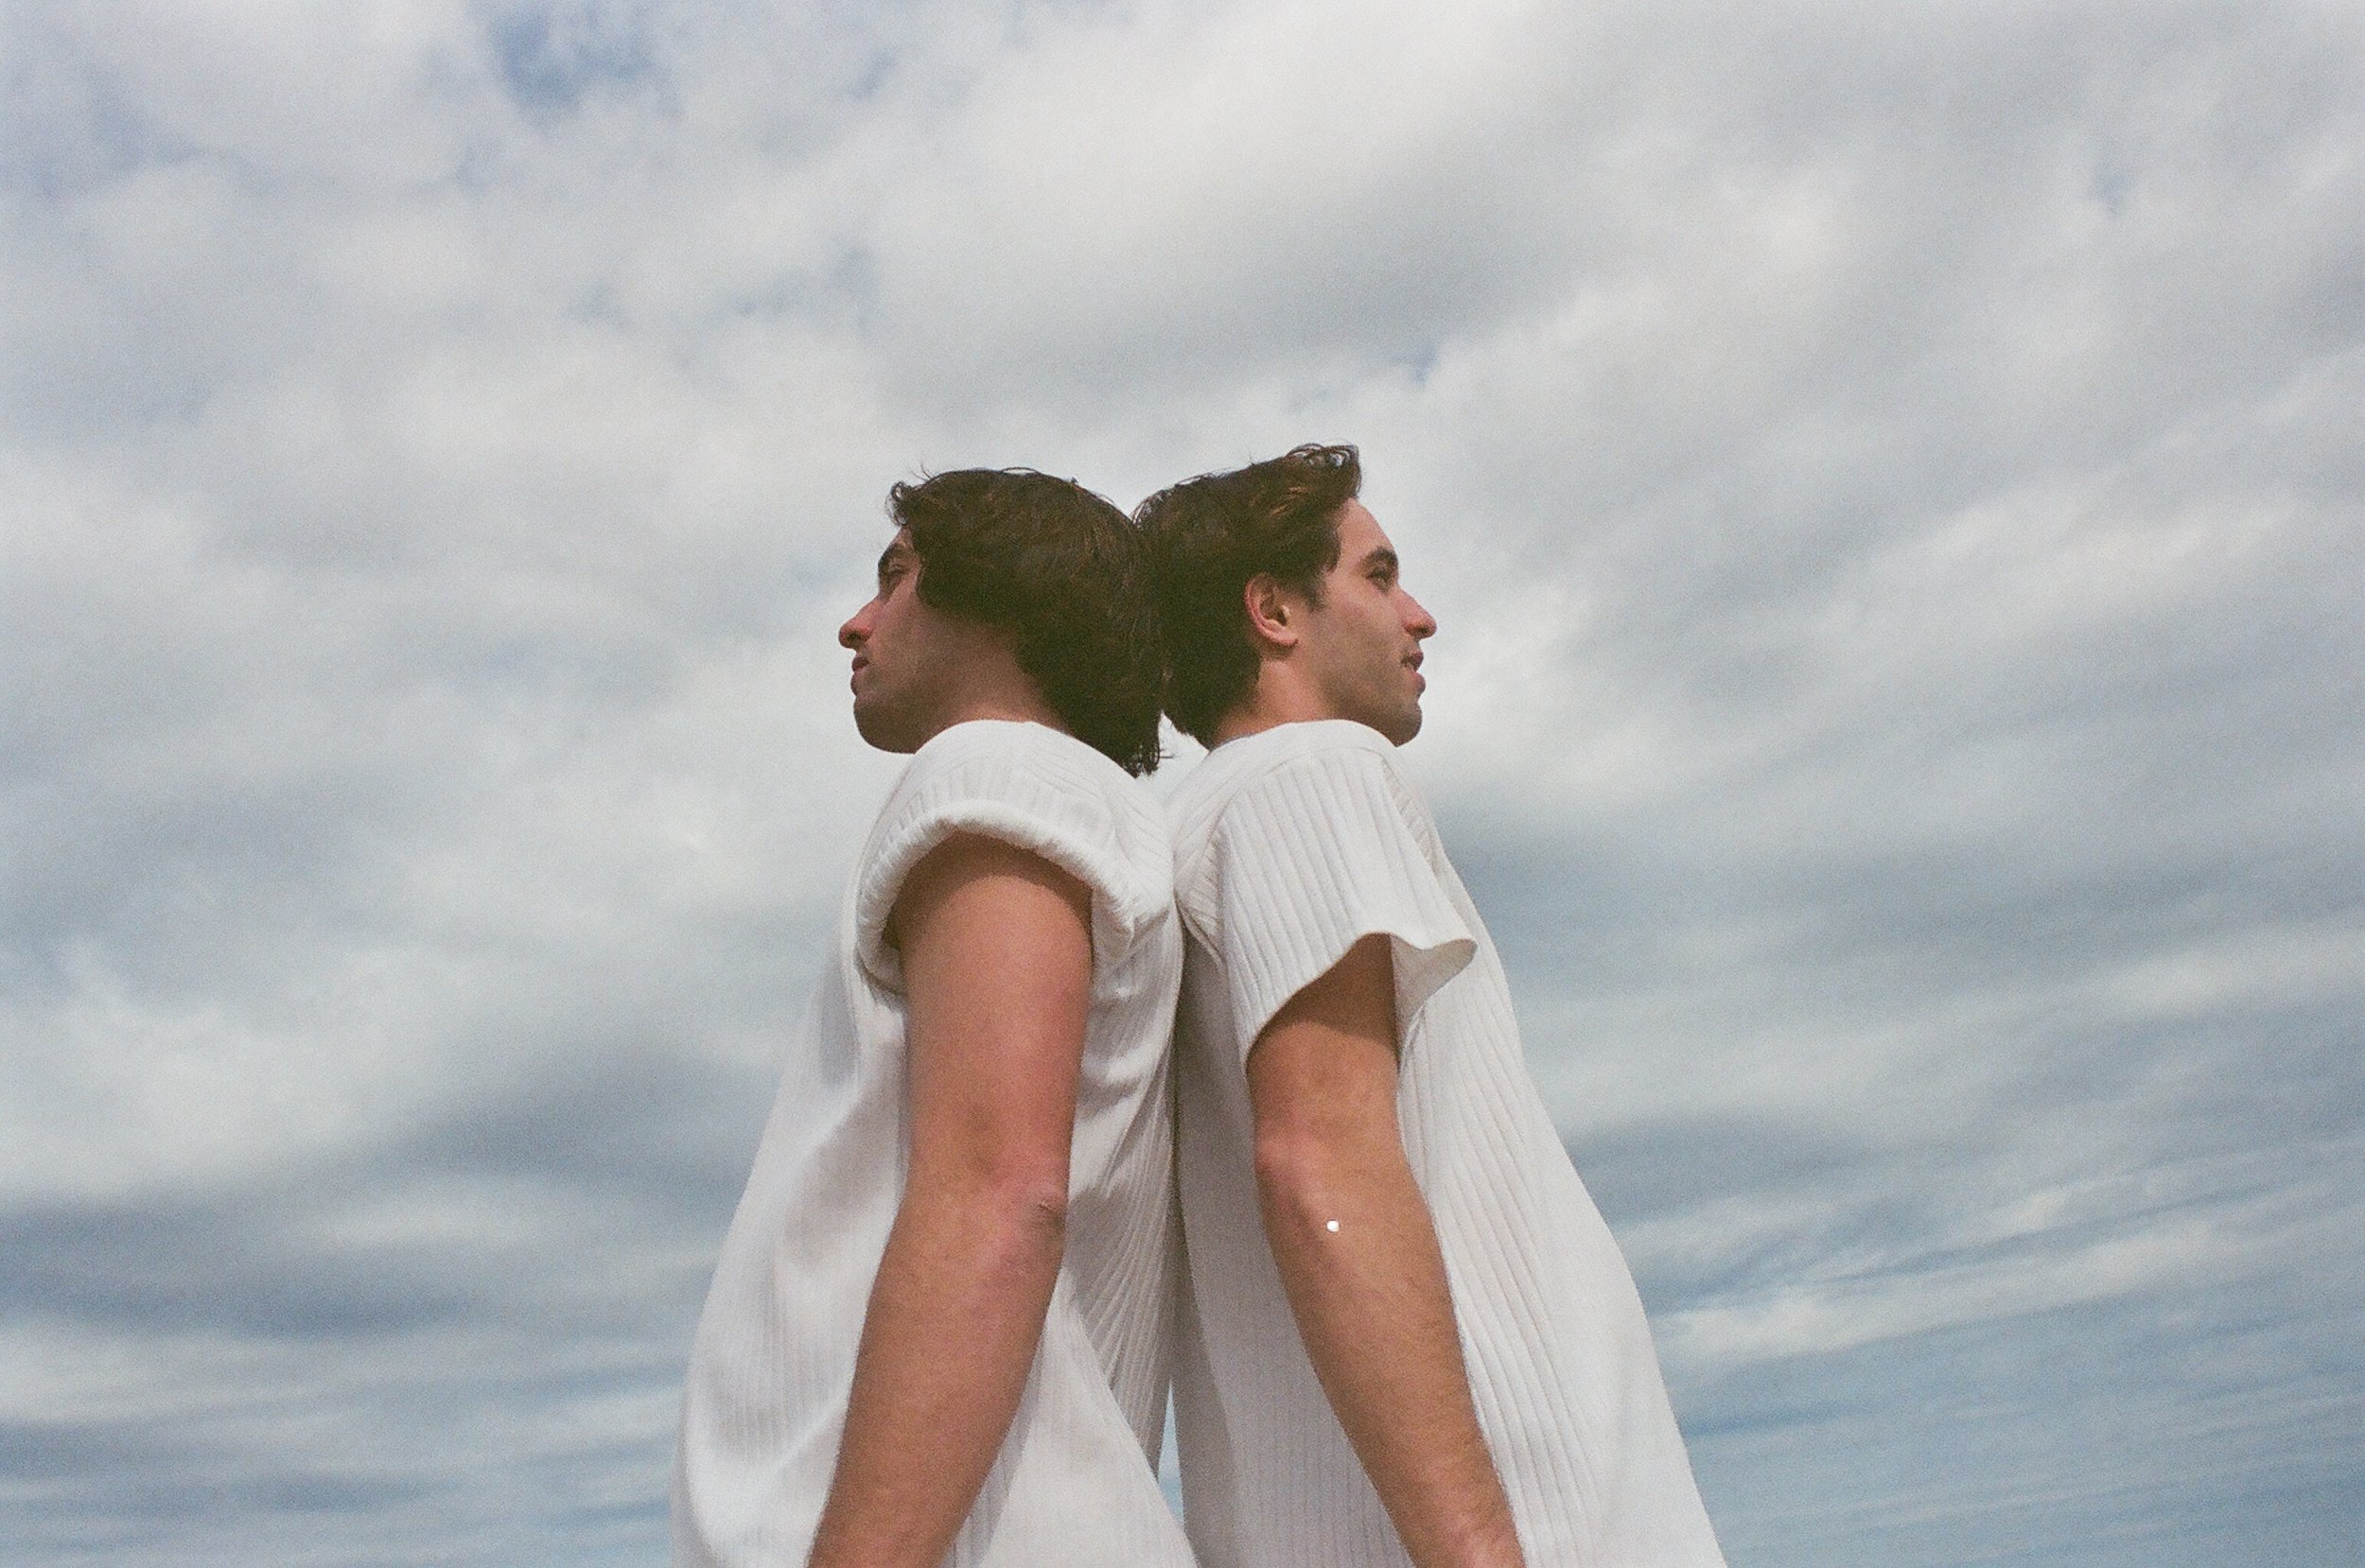 Chelsy-Mitchel-photographer-bode-nyc-fashion-beach-editorial-beachside-car-christian-matthew-rice-sky-fashion.JPG